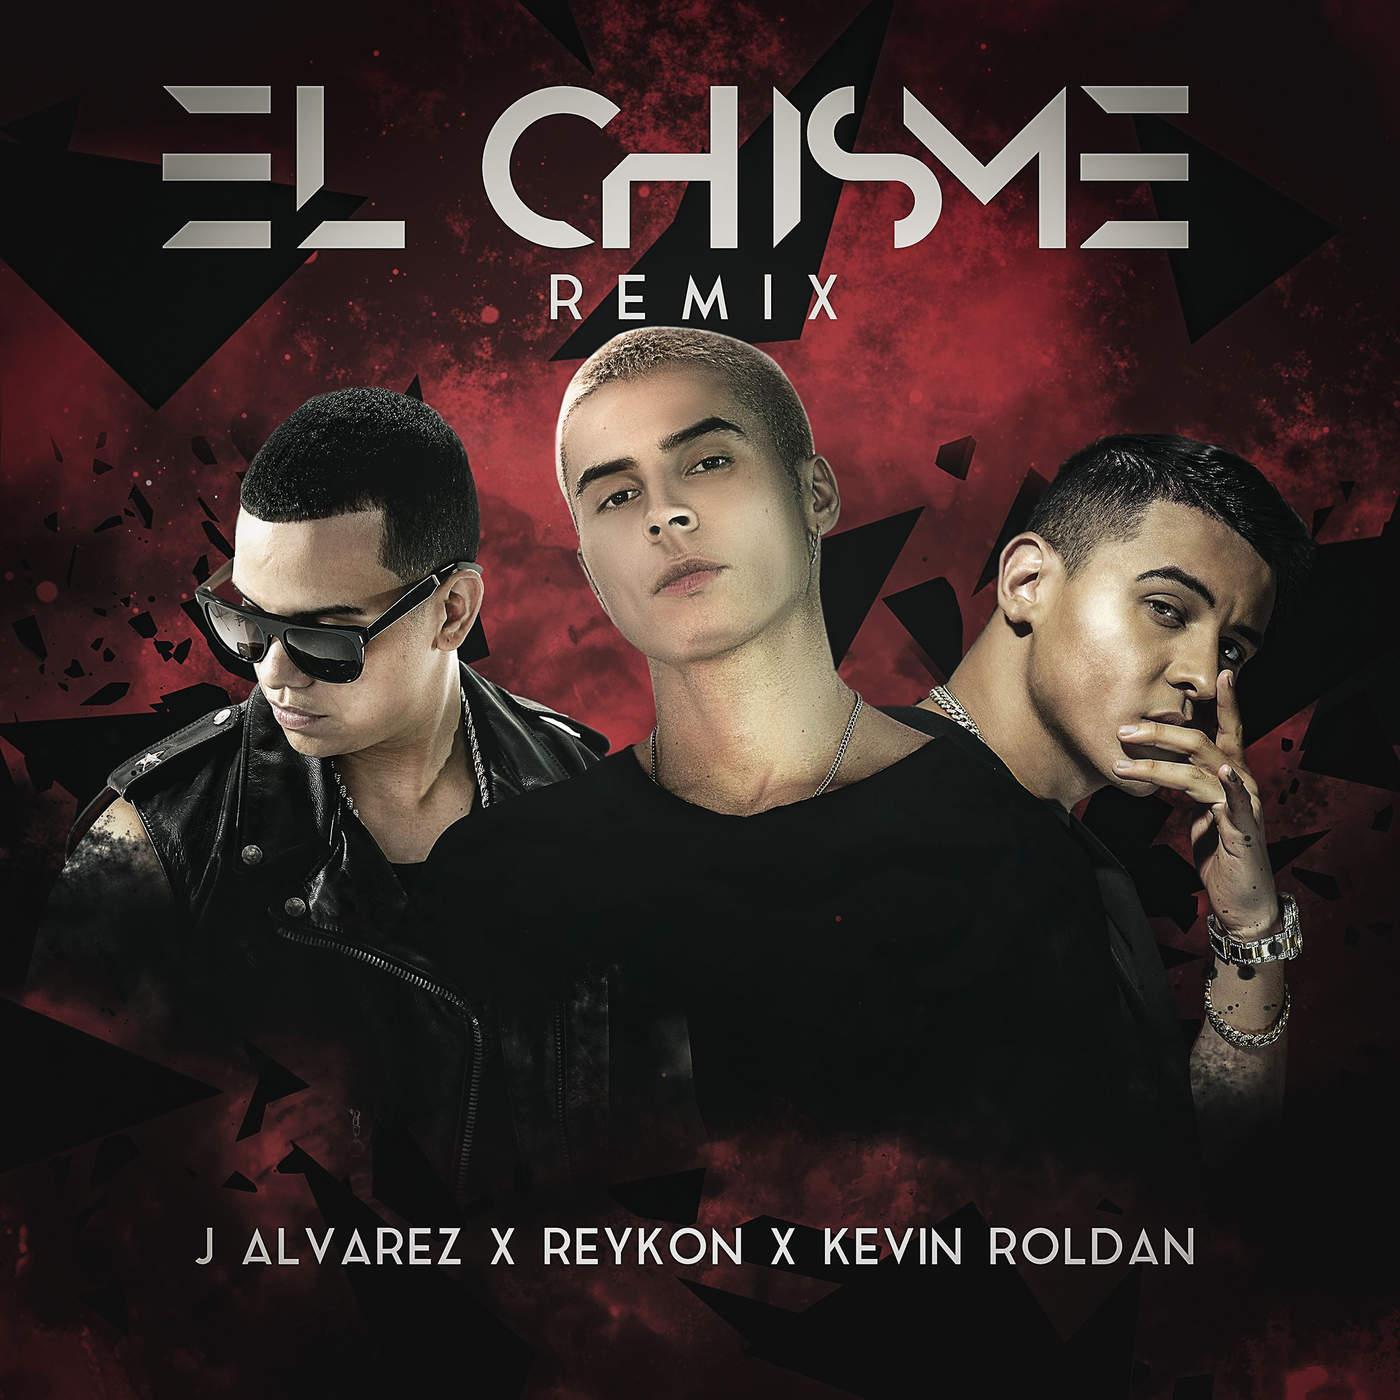 Reykon Ft J Alvarez Y Kevin Roldan – El Chisme (Official Remix)